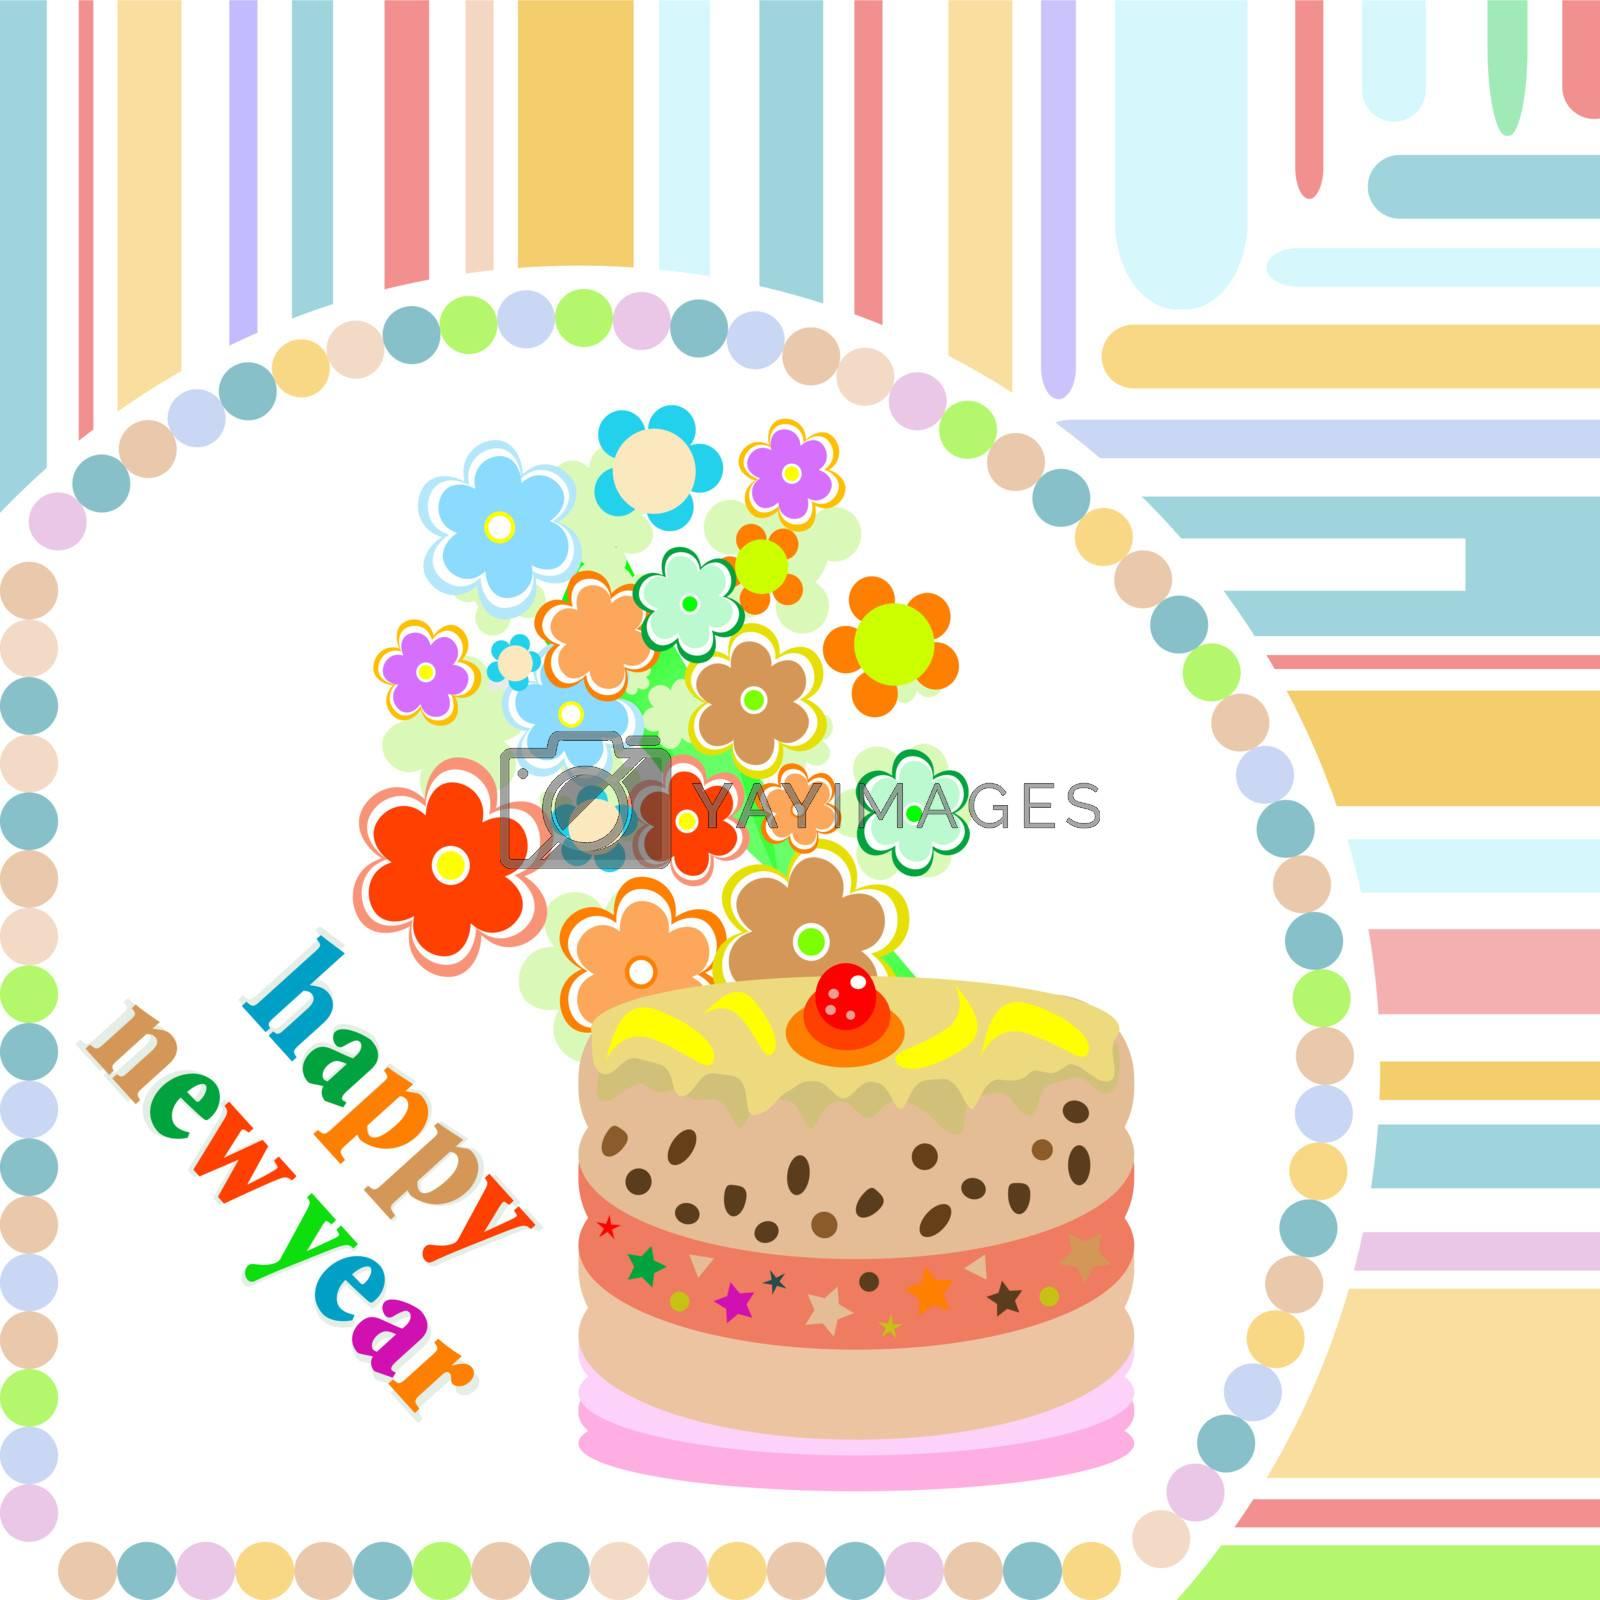 Happy New Year greeting card. vector Christmas holiday 2012